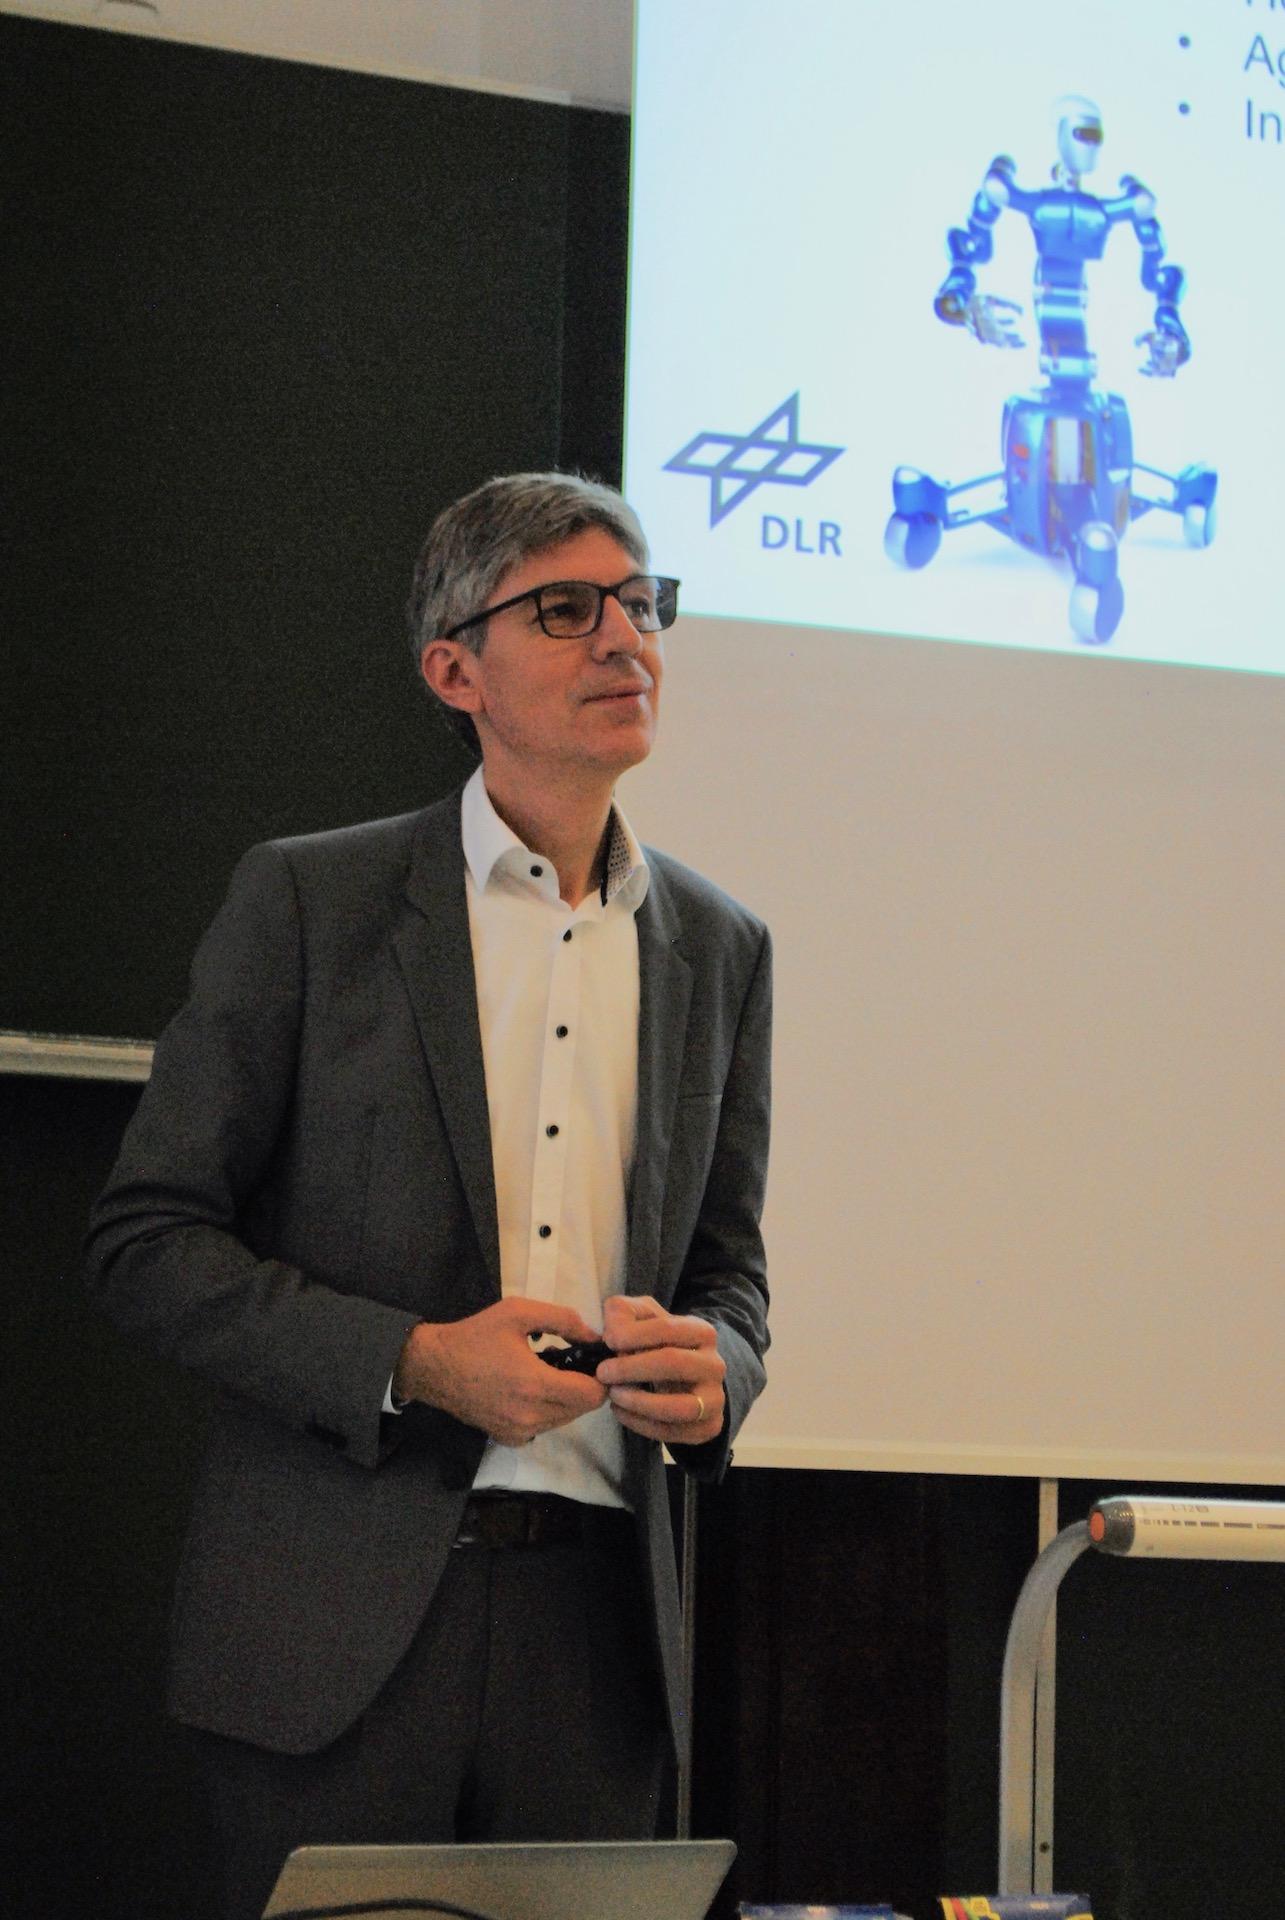 Professor Albu-Schäffer gives a lecture